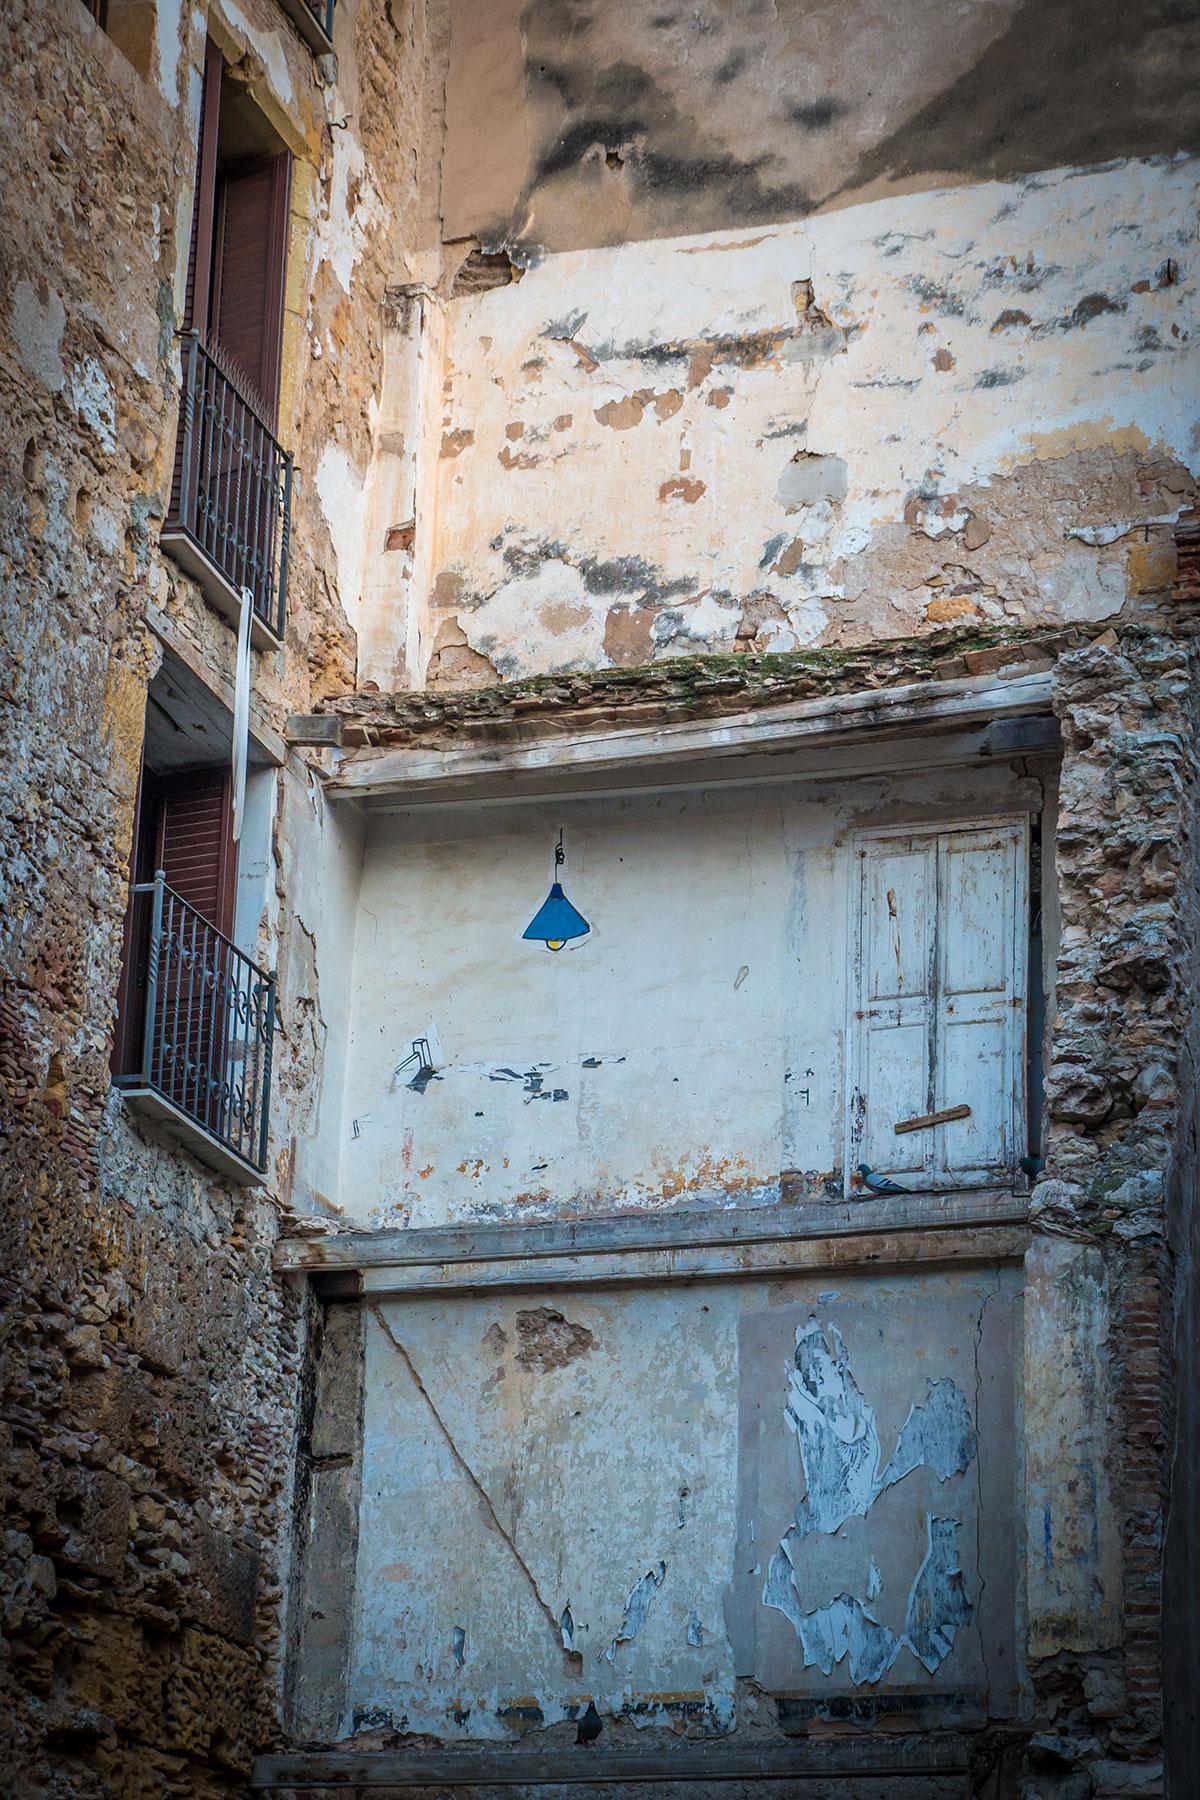 Spain, Catalonia, Tarragona, wall with graffiti